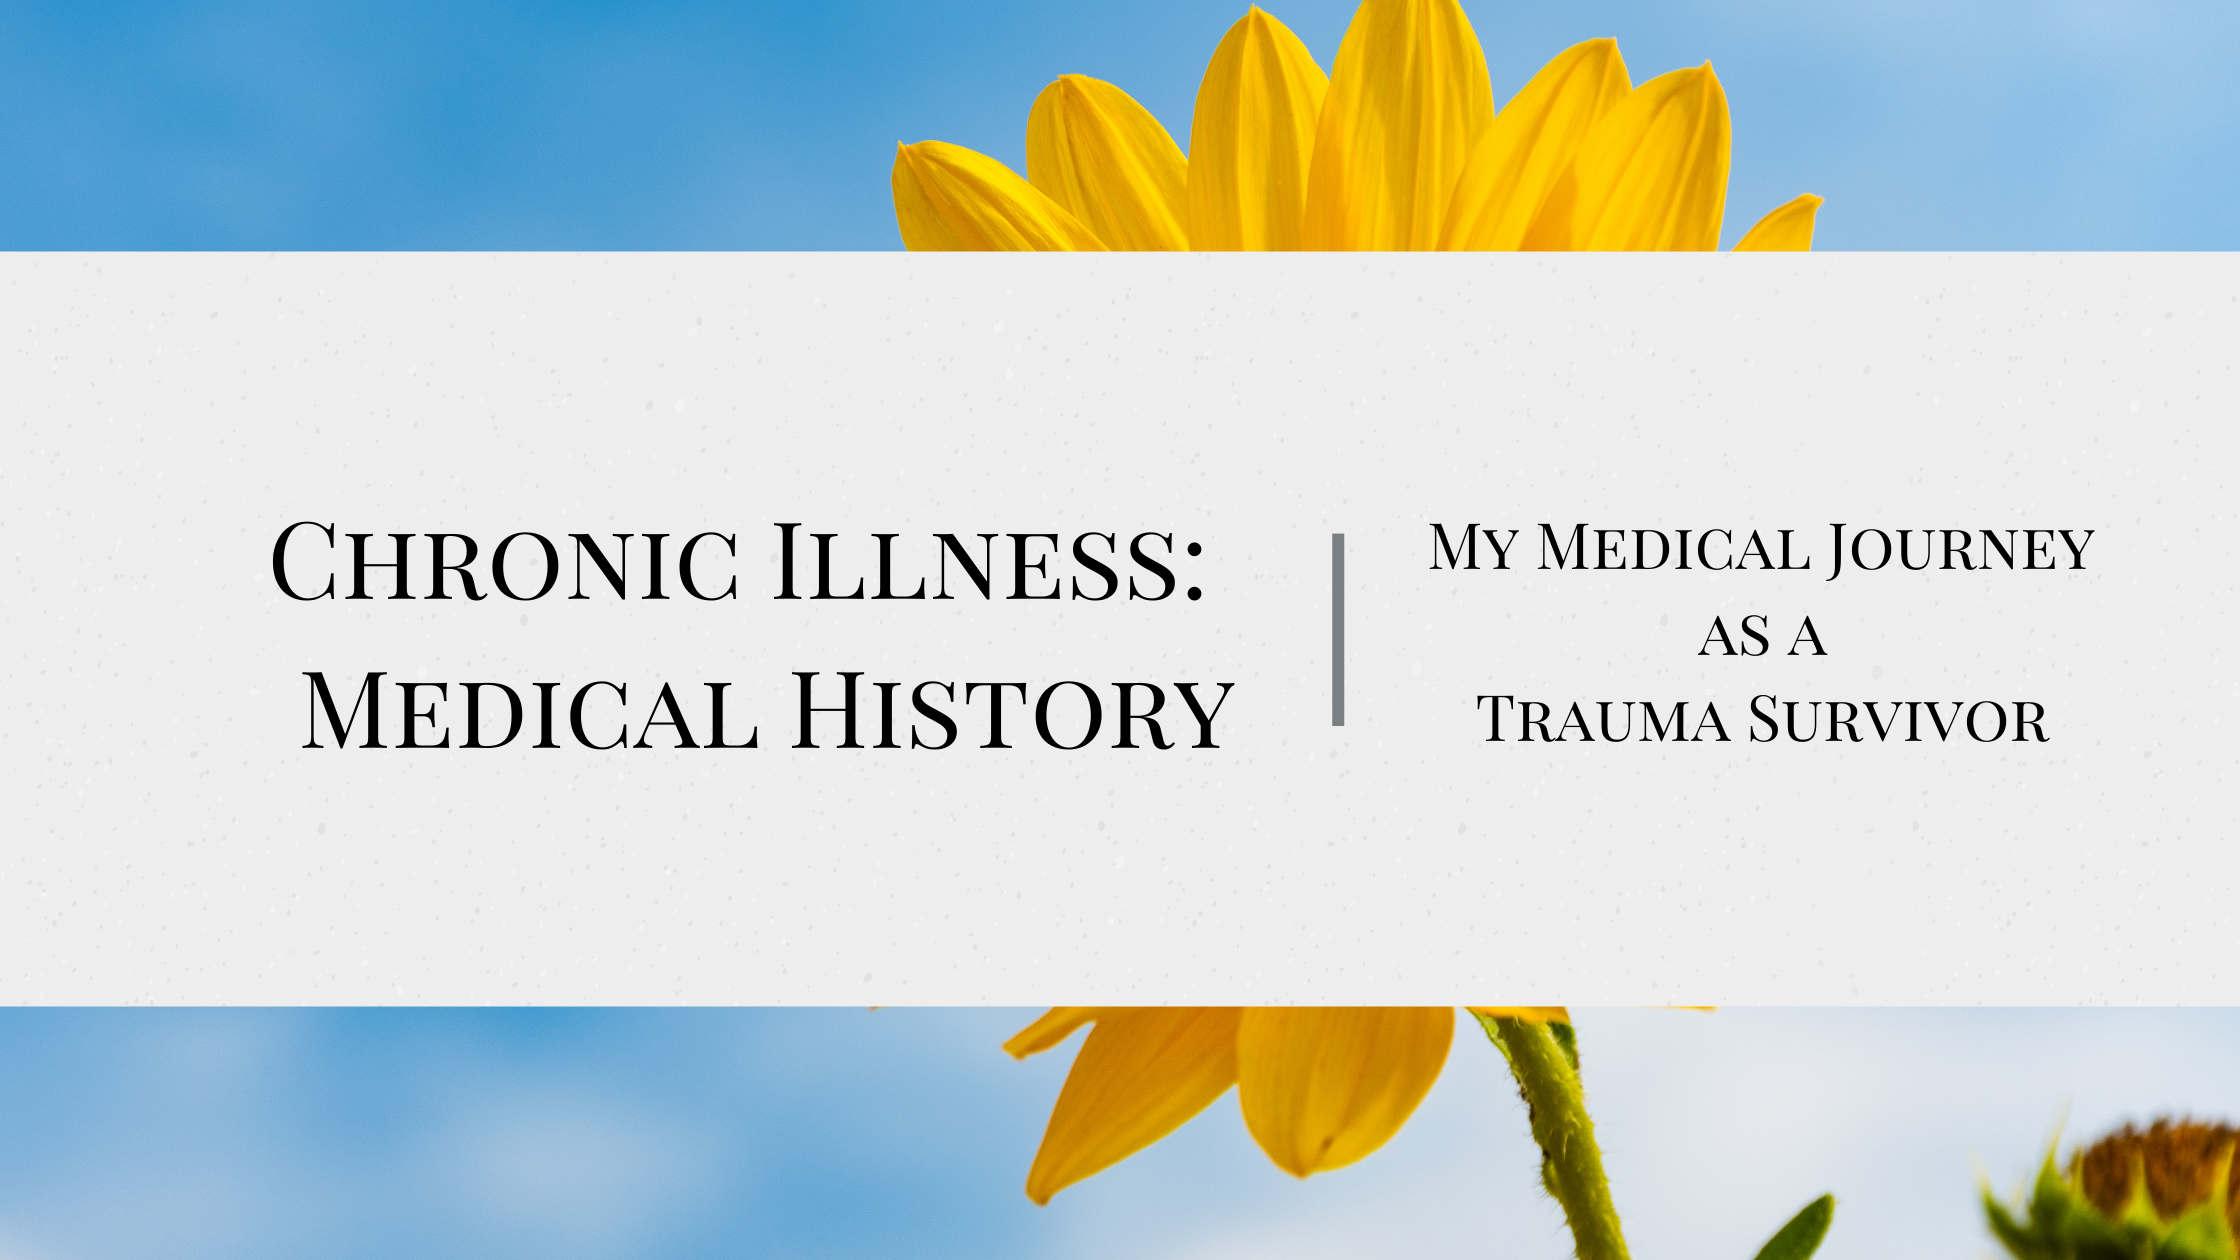 Chronic Illness: Medical History